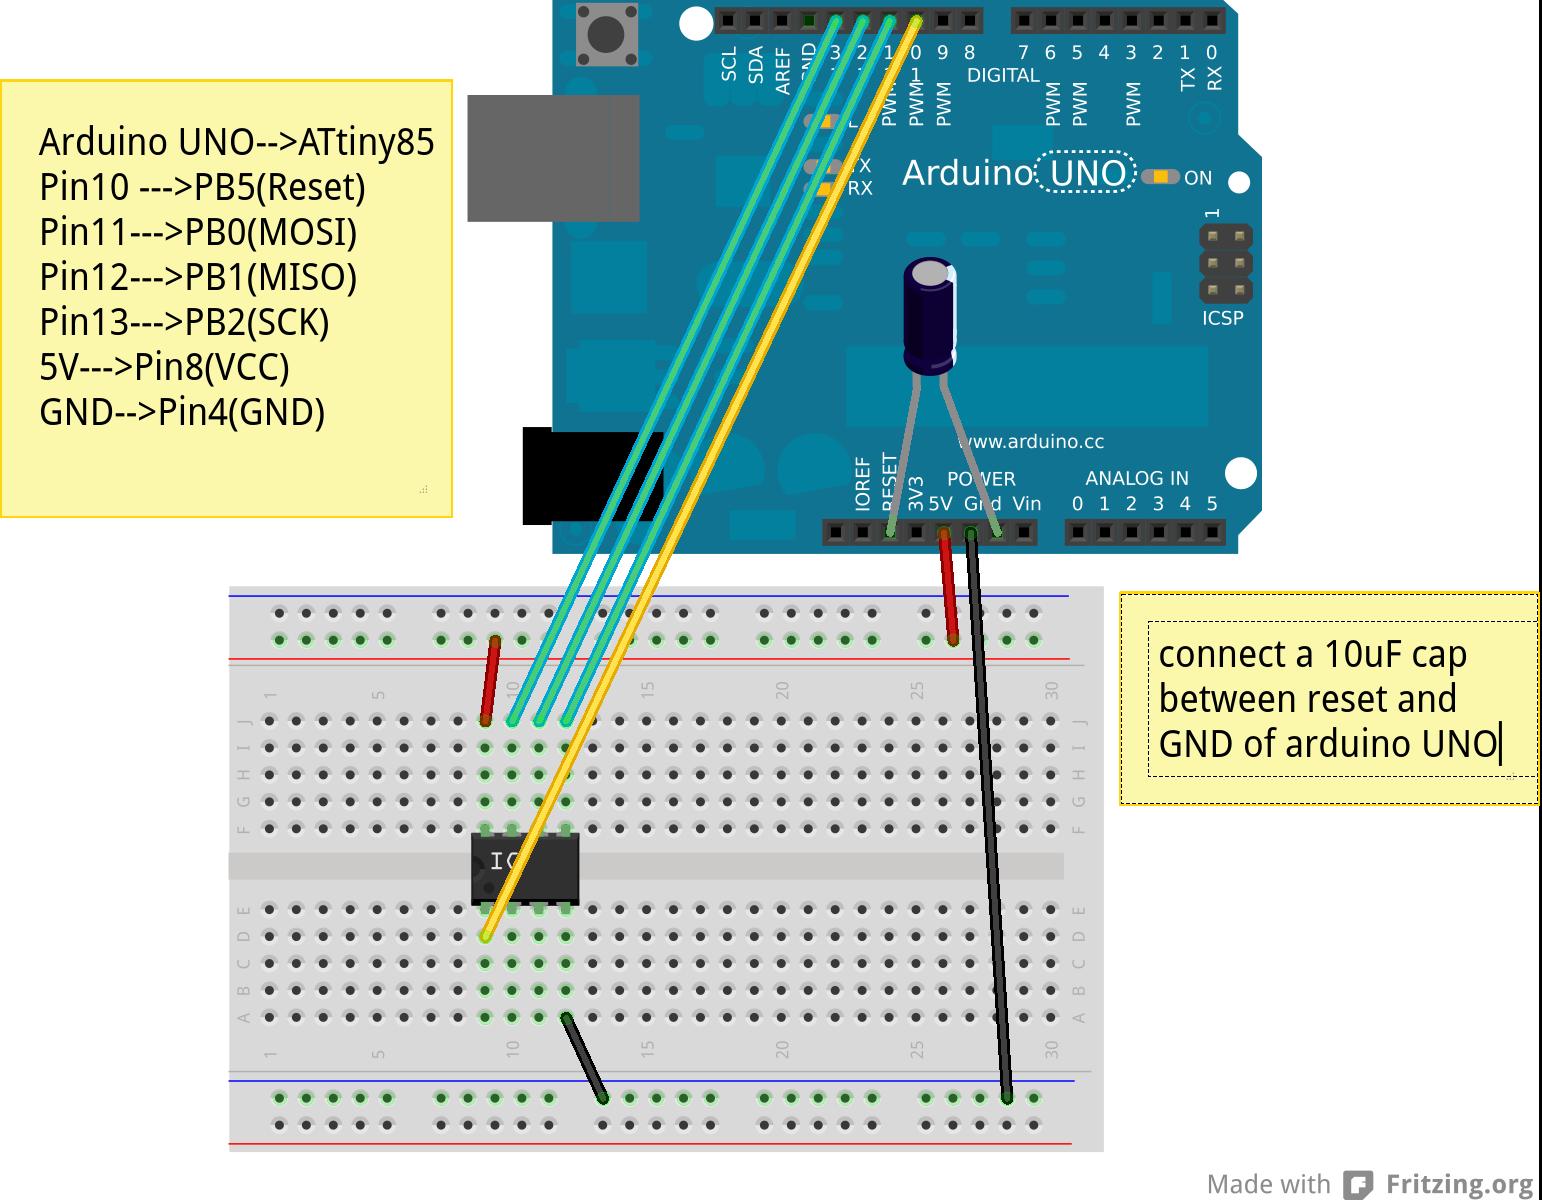 Attiny Rx Tx Google Search Pinterest Arduino Franklin Oscillator Circuit Tesla Shuttle How To